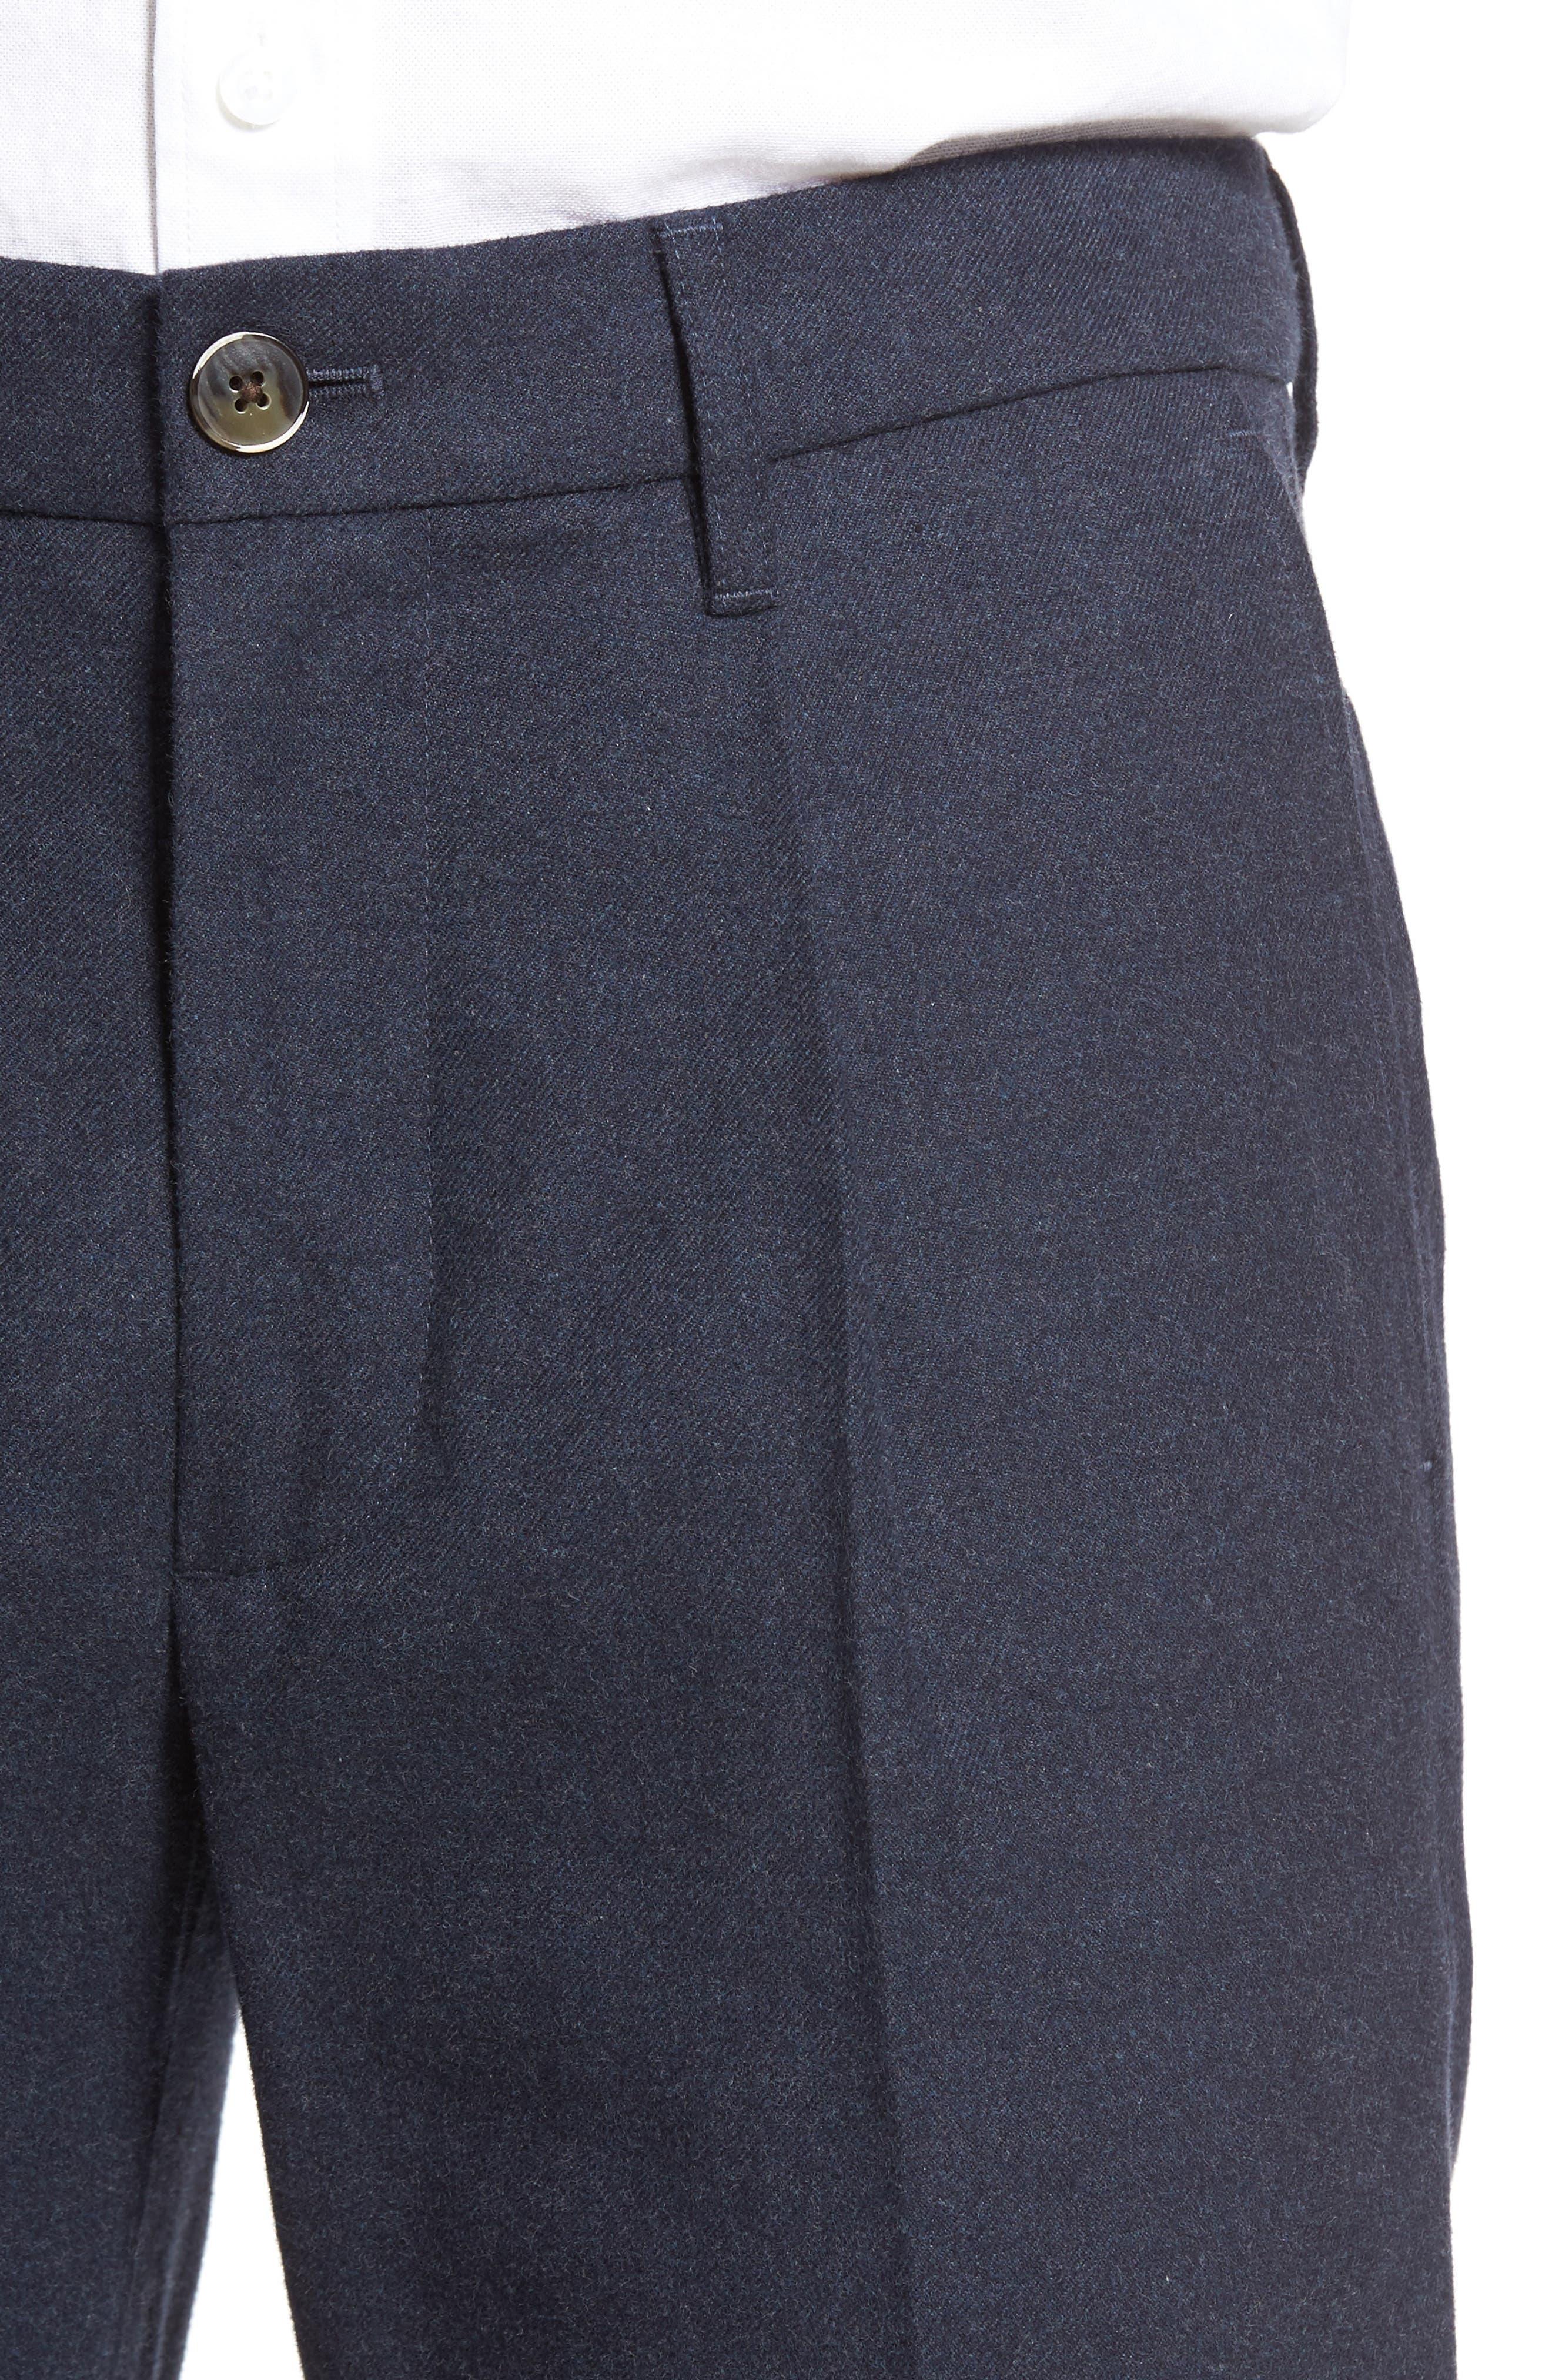 BONOBOS,                             Slim Fit Flannel Trousers,                             Alternate thumbnail 5, color,                             400